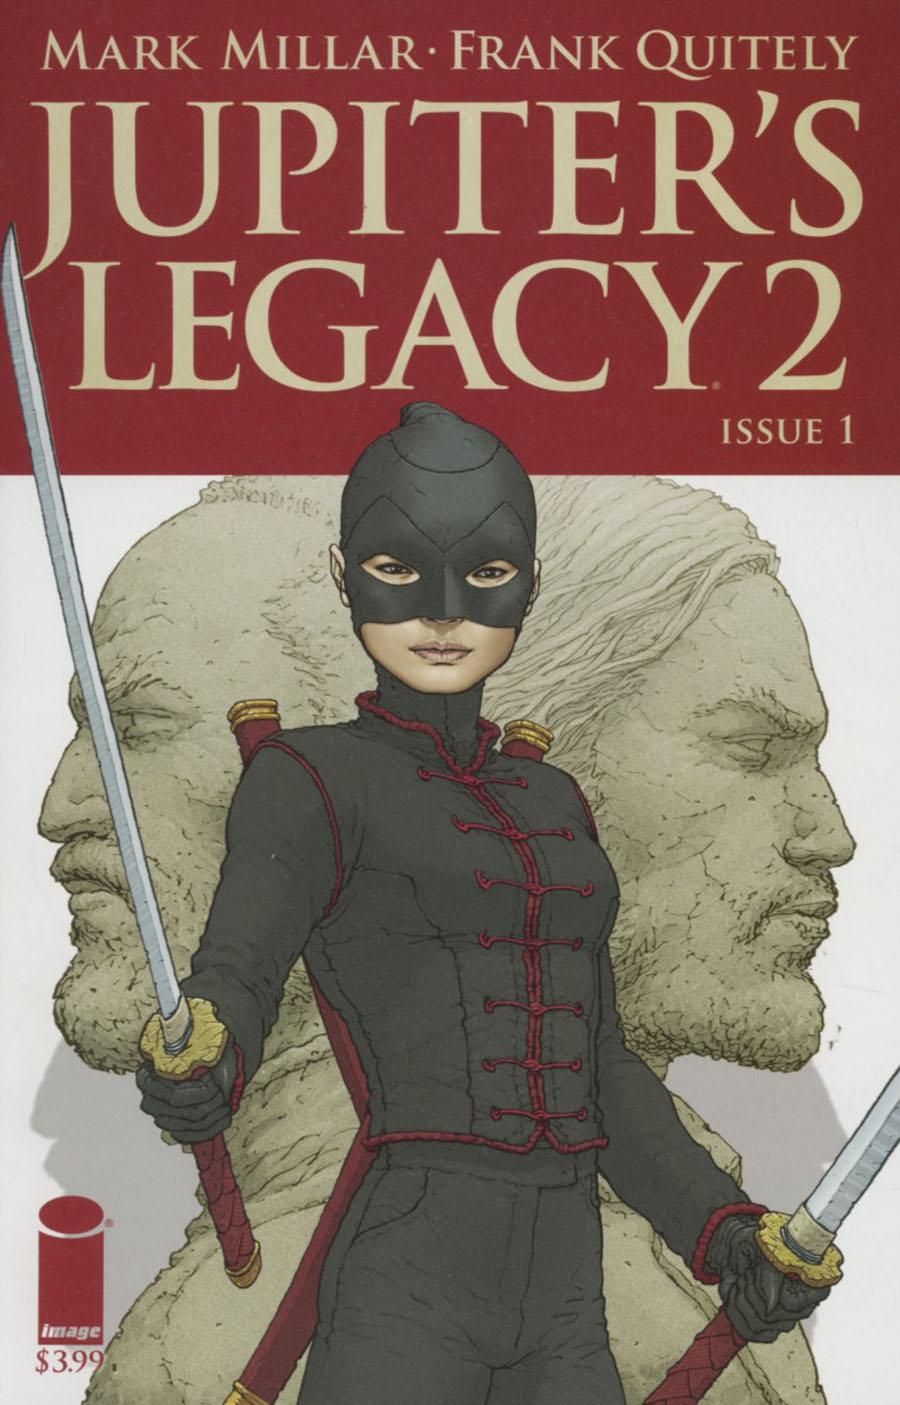 Jupiters Legacy Vol 2 #1 Cover I 2nd Ptg Frank Quitely Variant Cover